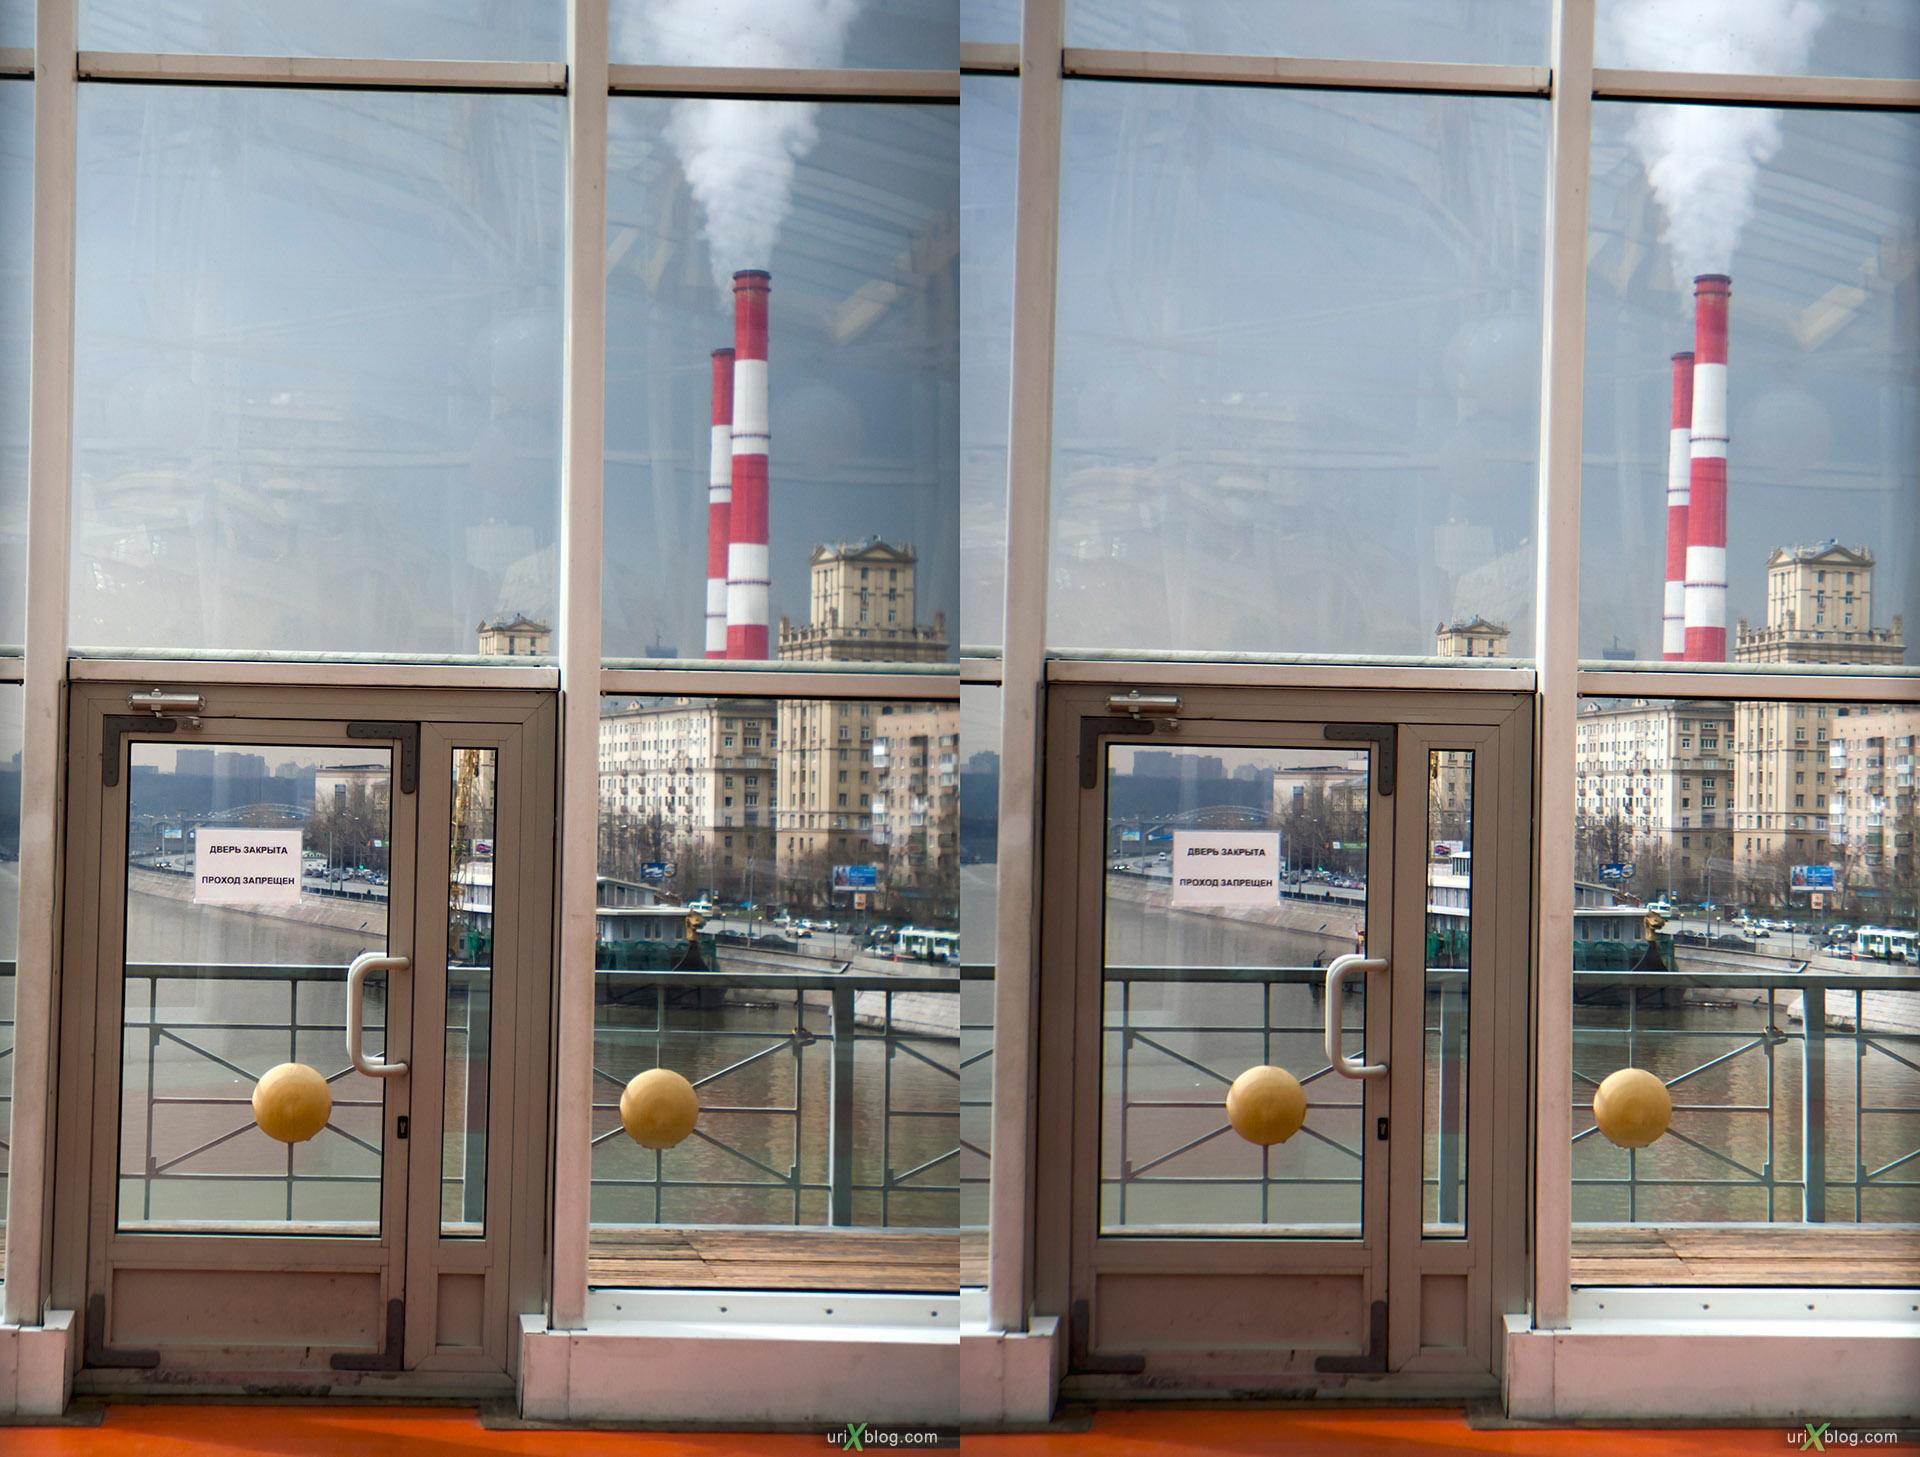 Loreo 3D lens in a cap стерео, стереопара Moscow, Kievsky Bridge, Bogdan Khmelnitskiy Bridge, Киевский мост, мост Богдана Хмельницкого, Москва, stereo, стерео, cross-eyed, 3D